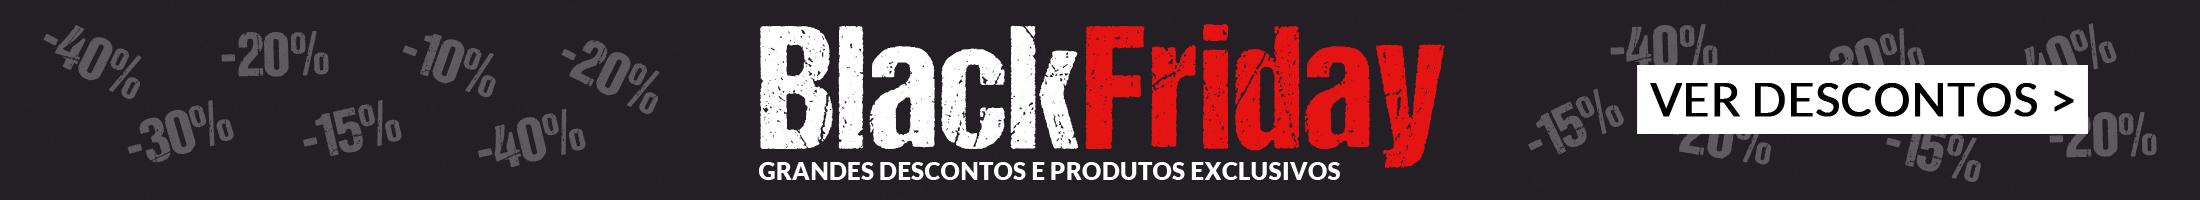 Black Friday Brinquedos